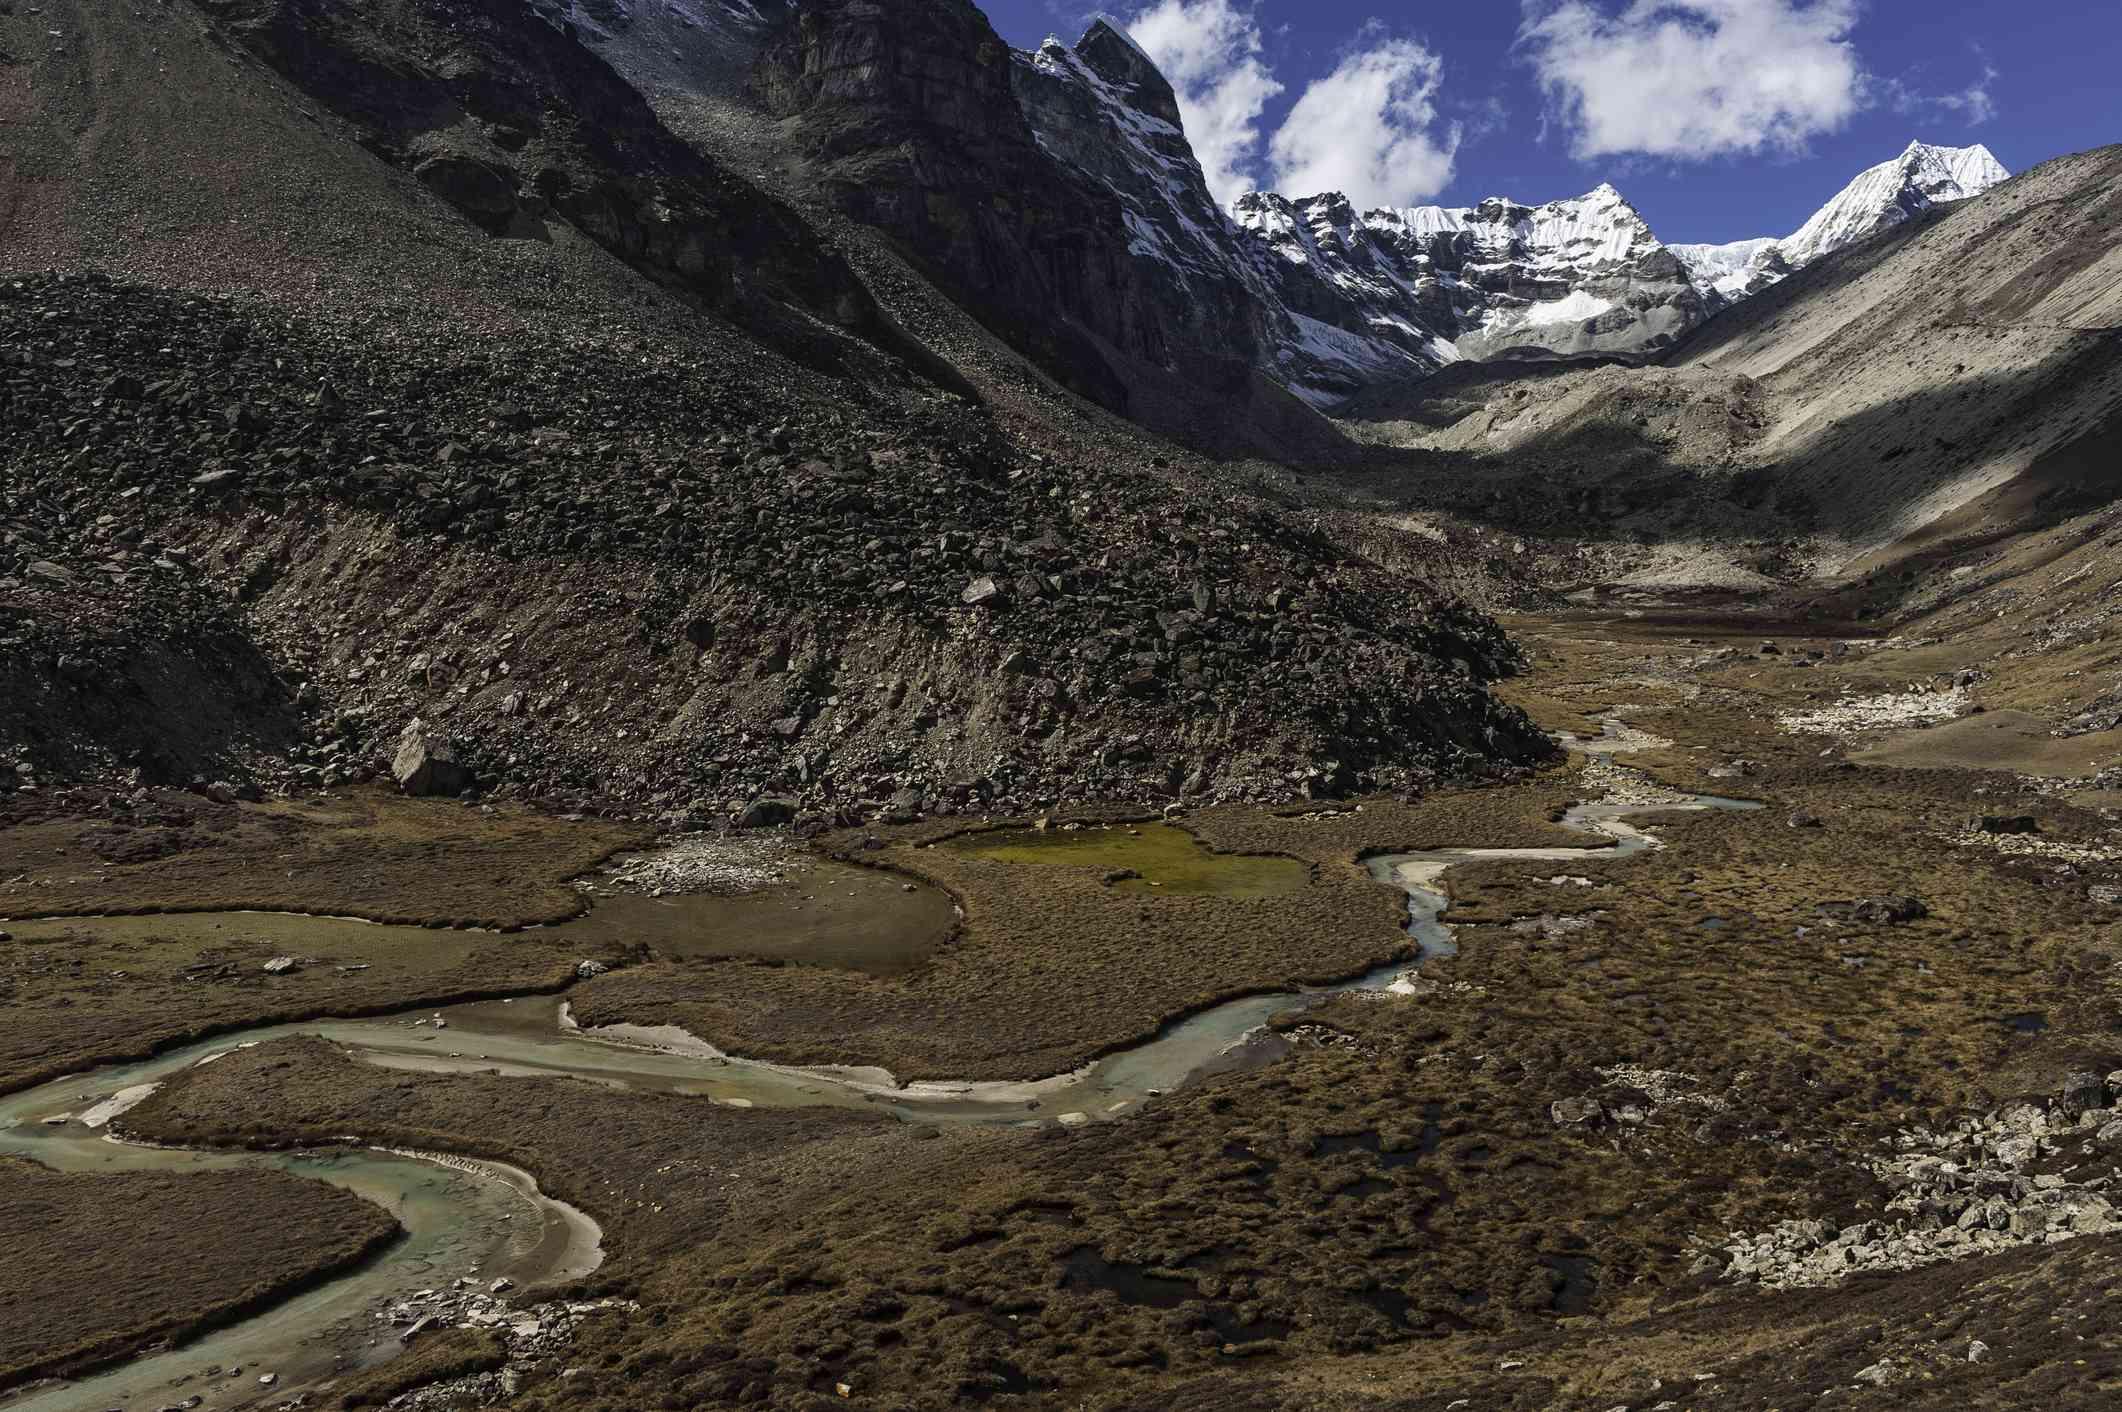 río que atraviesa un valle marrón con montañas nevadas detrás , Monte Langtang cubierto de cerda